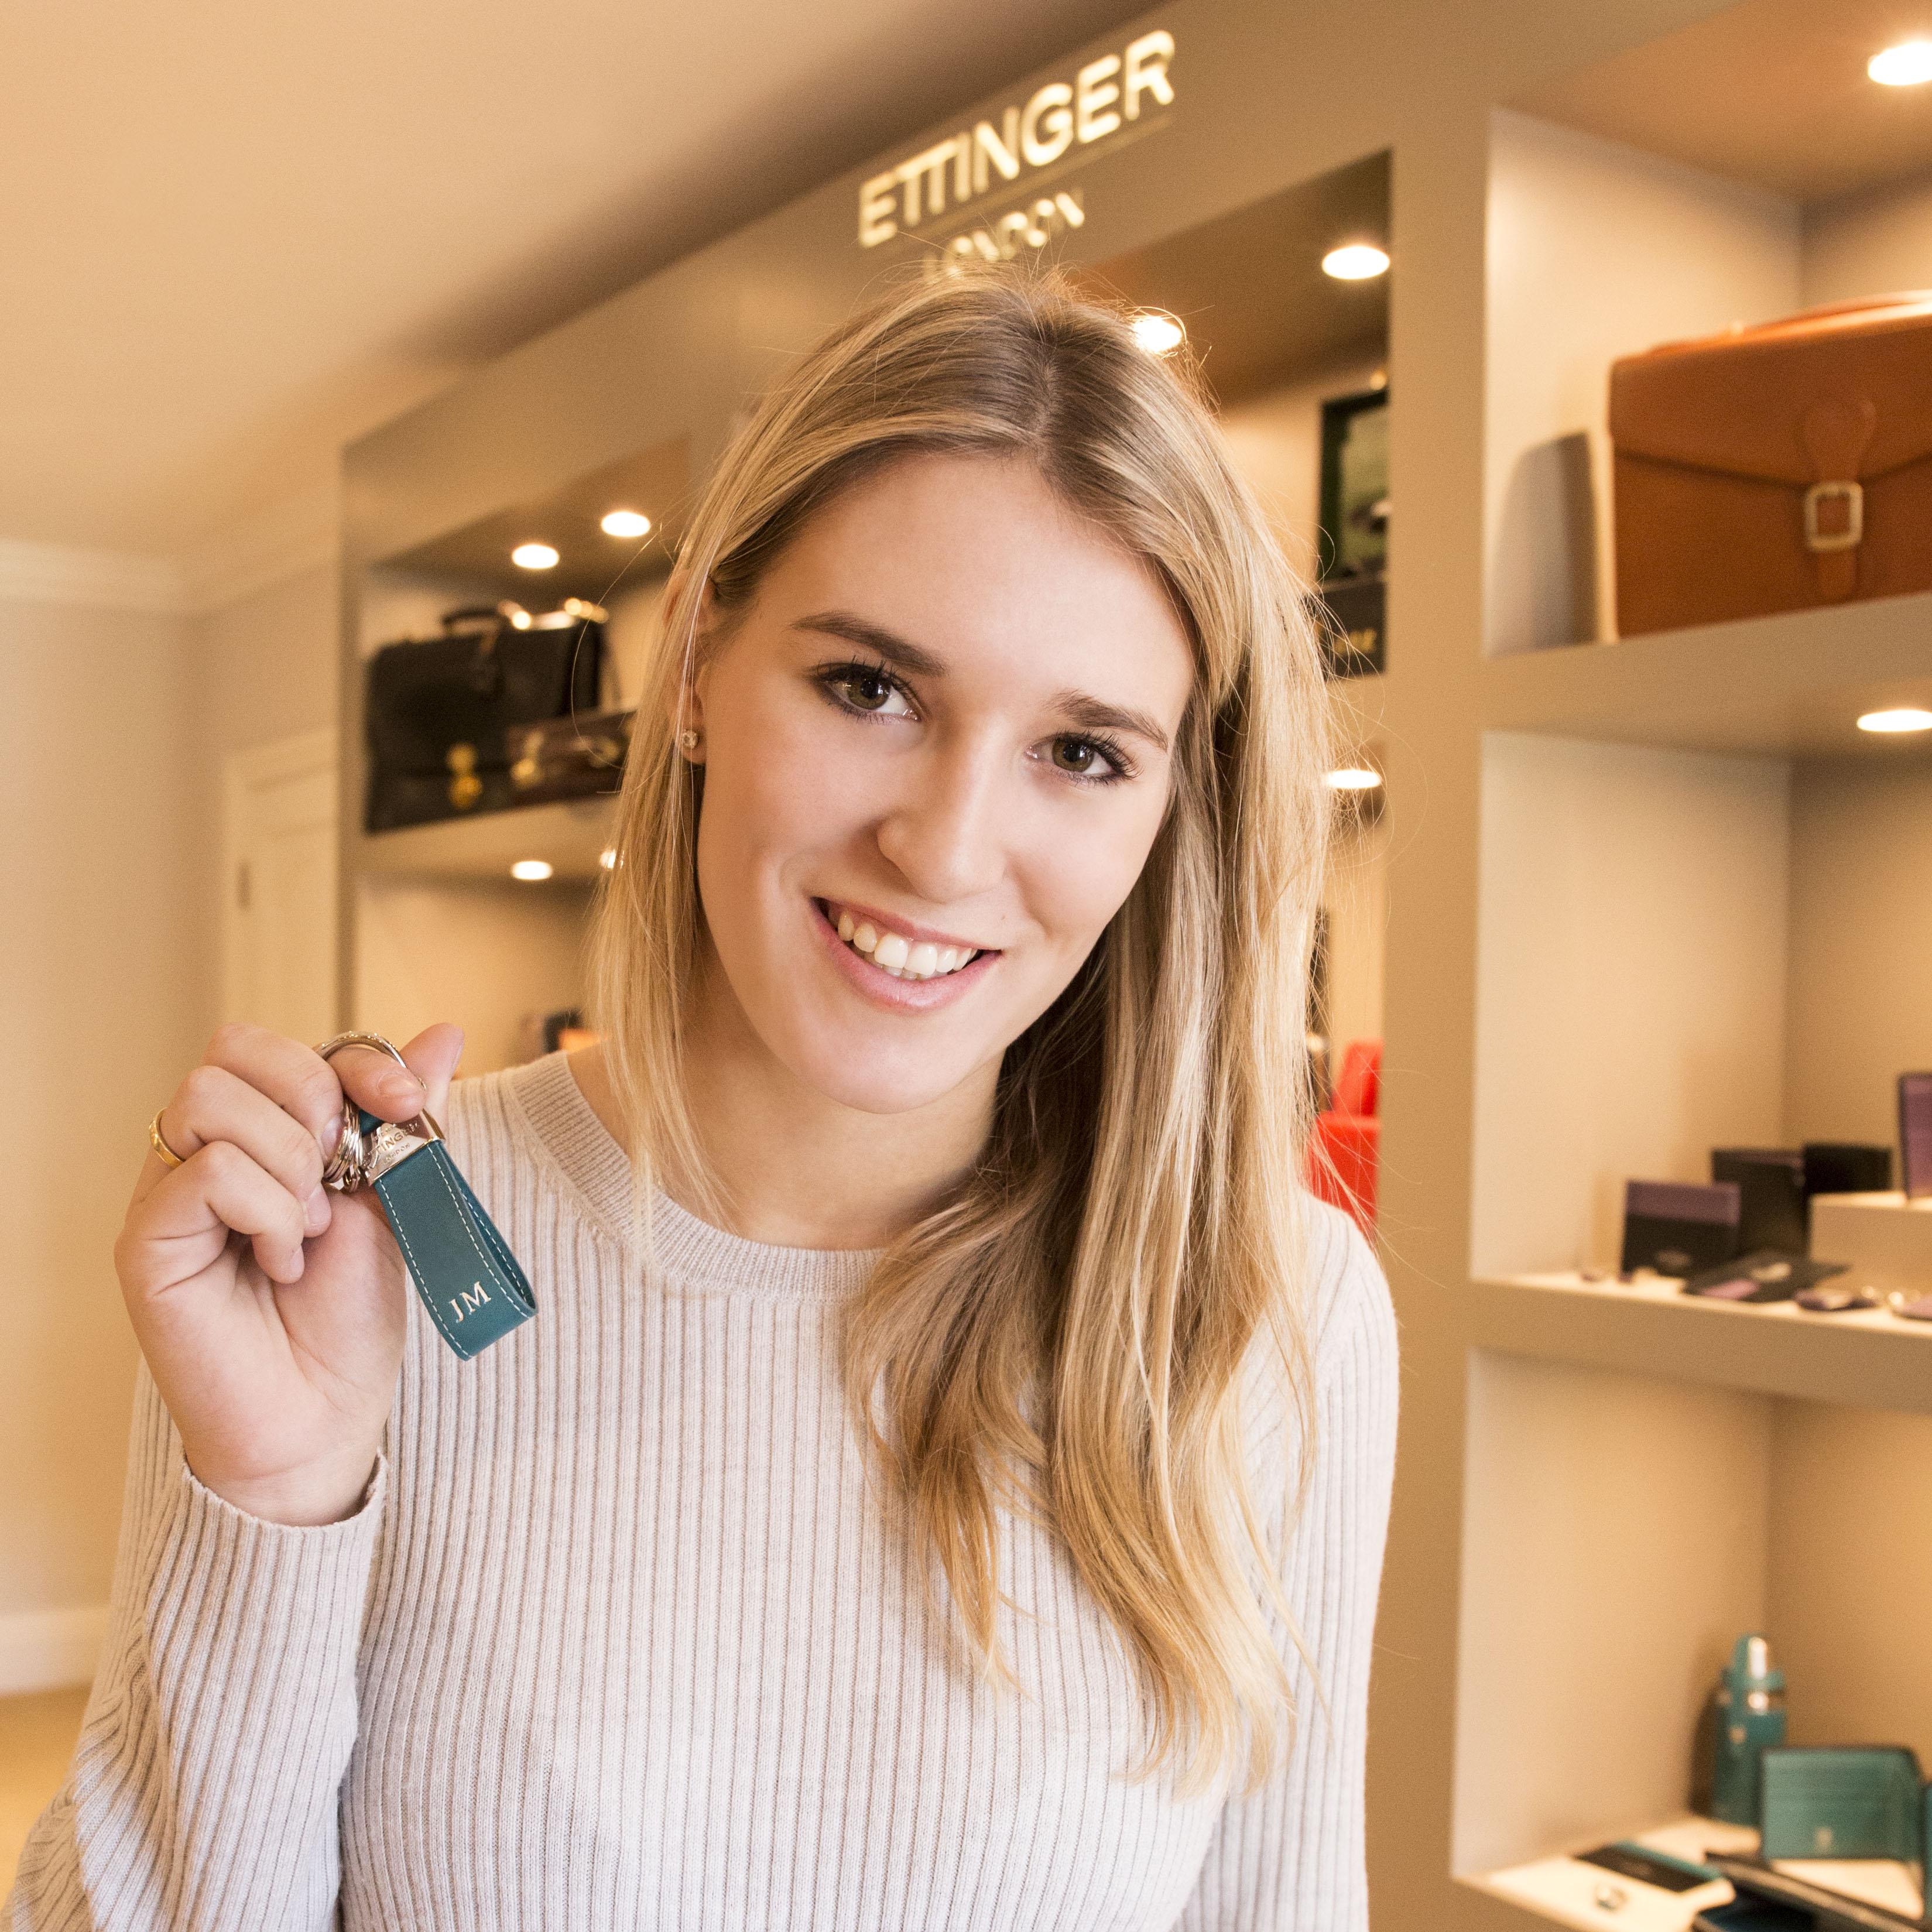 Jess Mendoza, Ettinger's luxury lifestyle brand ambassador